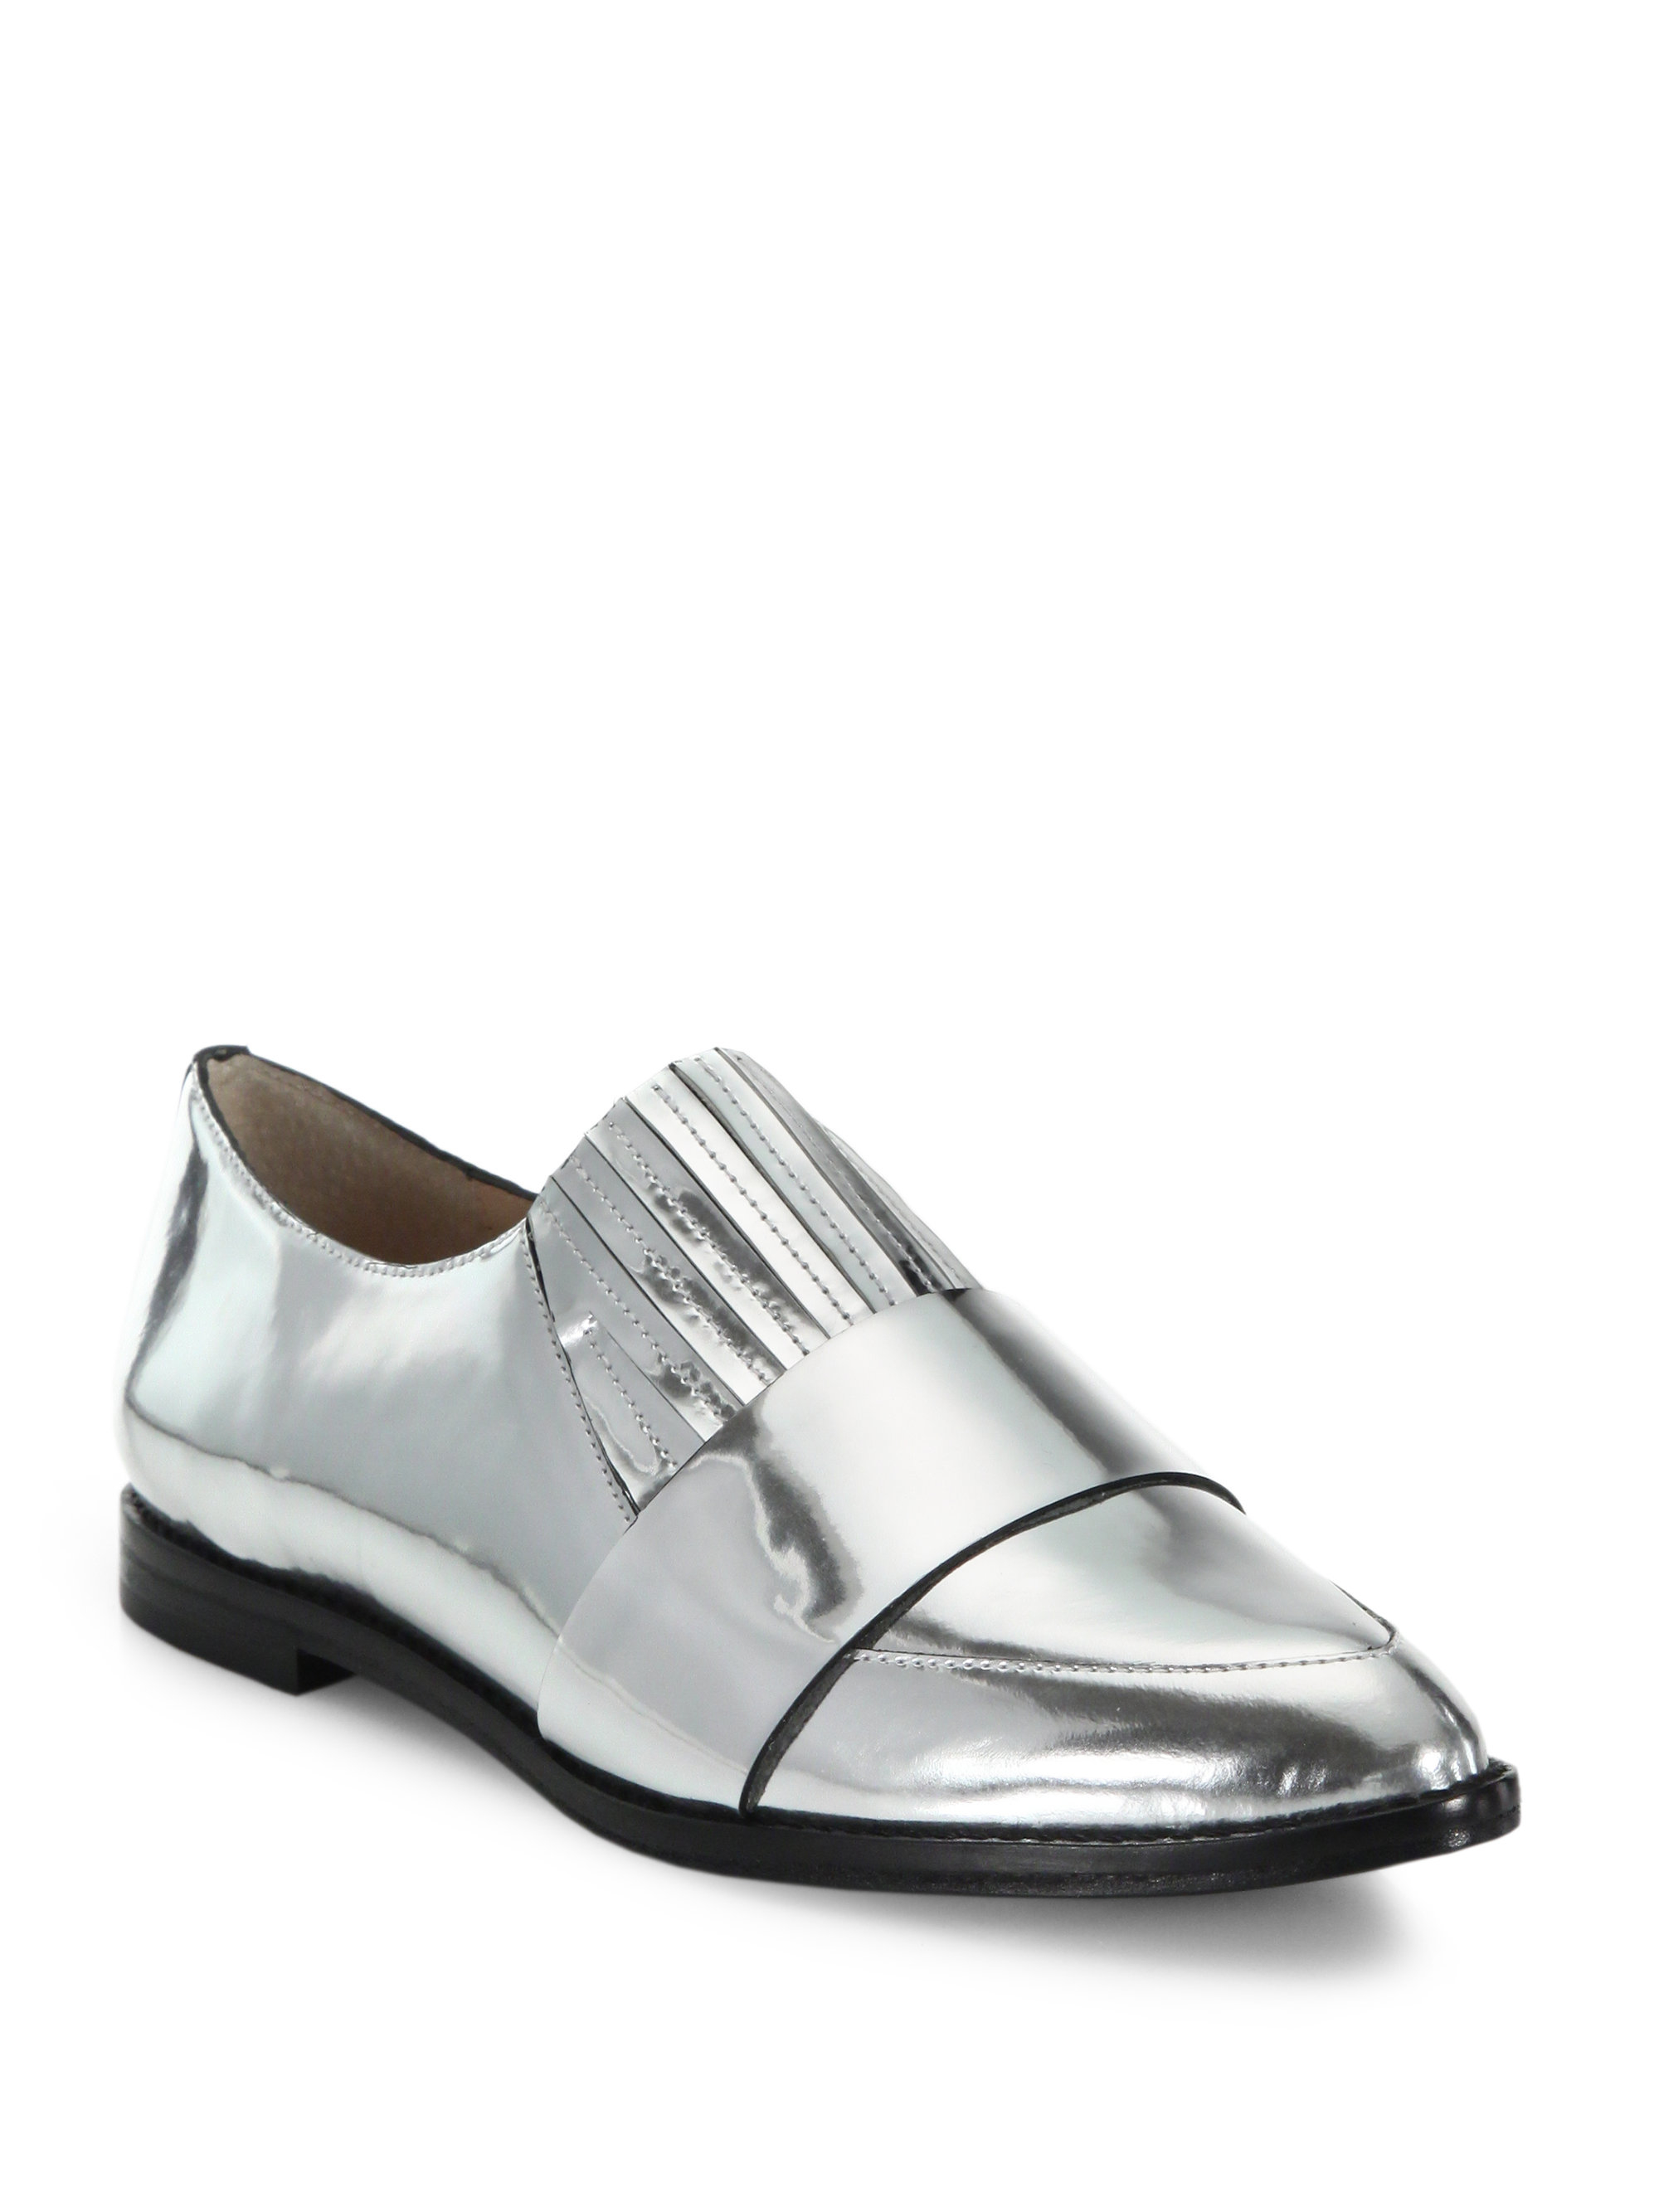 83b66bfacb2 Lyst - Loeffler Randall Rosa Point-toe Slip-on Shoes in Metallic